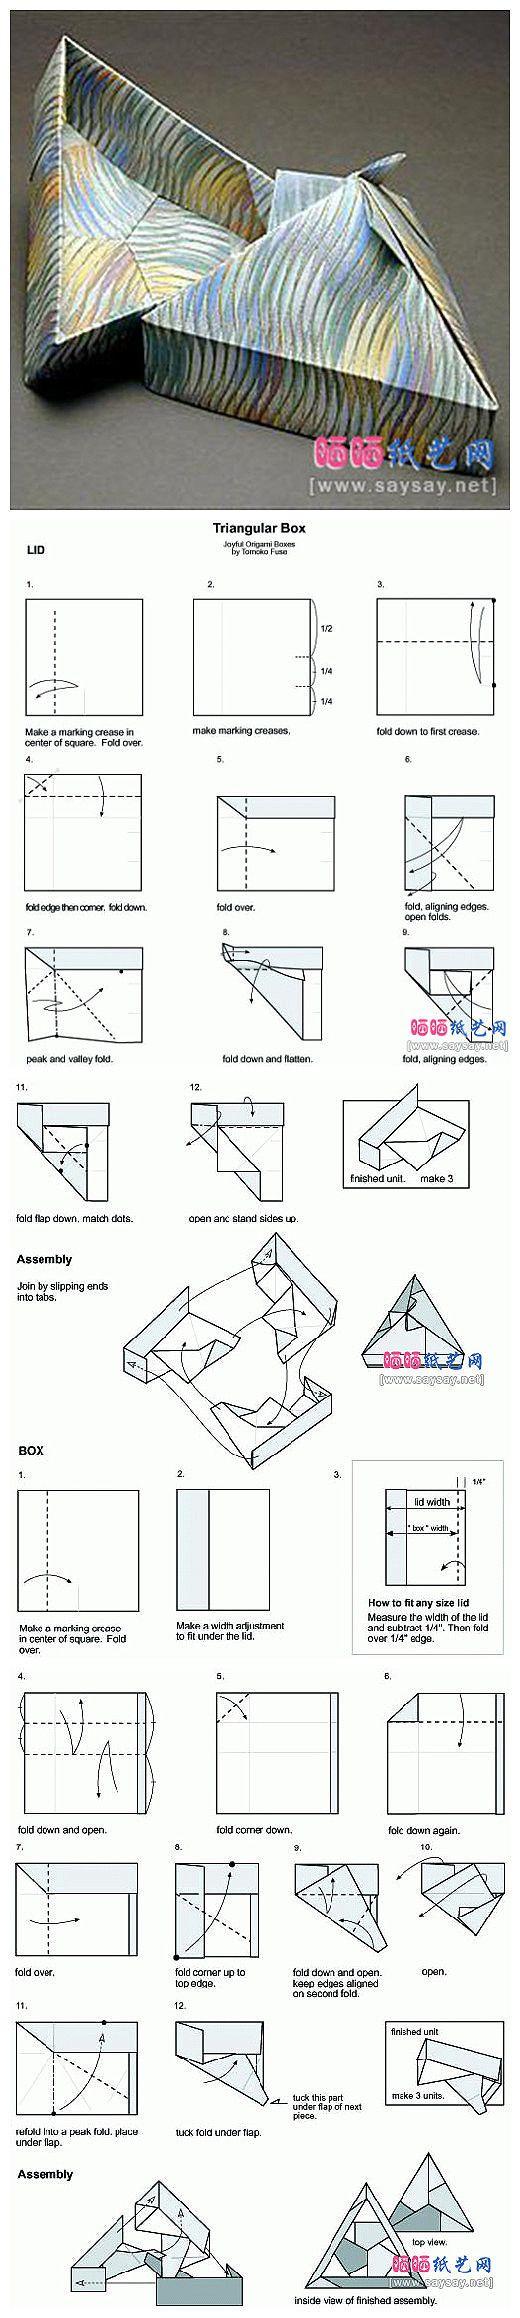 Triangular Origami Box By Tomoko Fuse  Diagrams